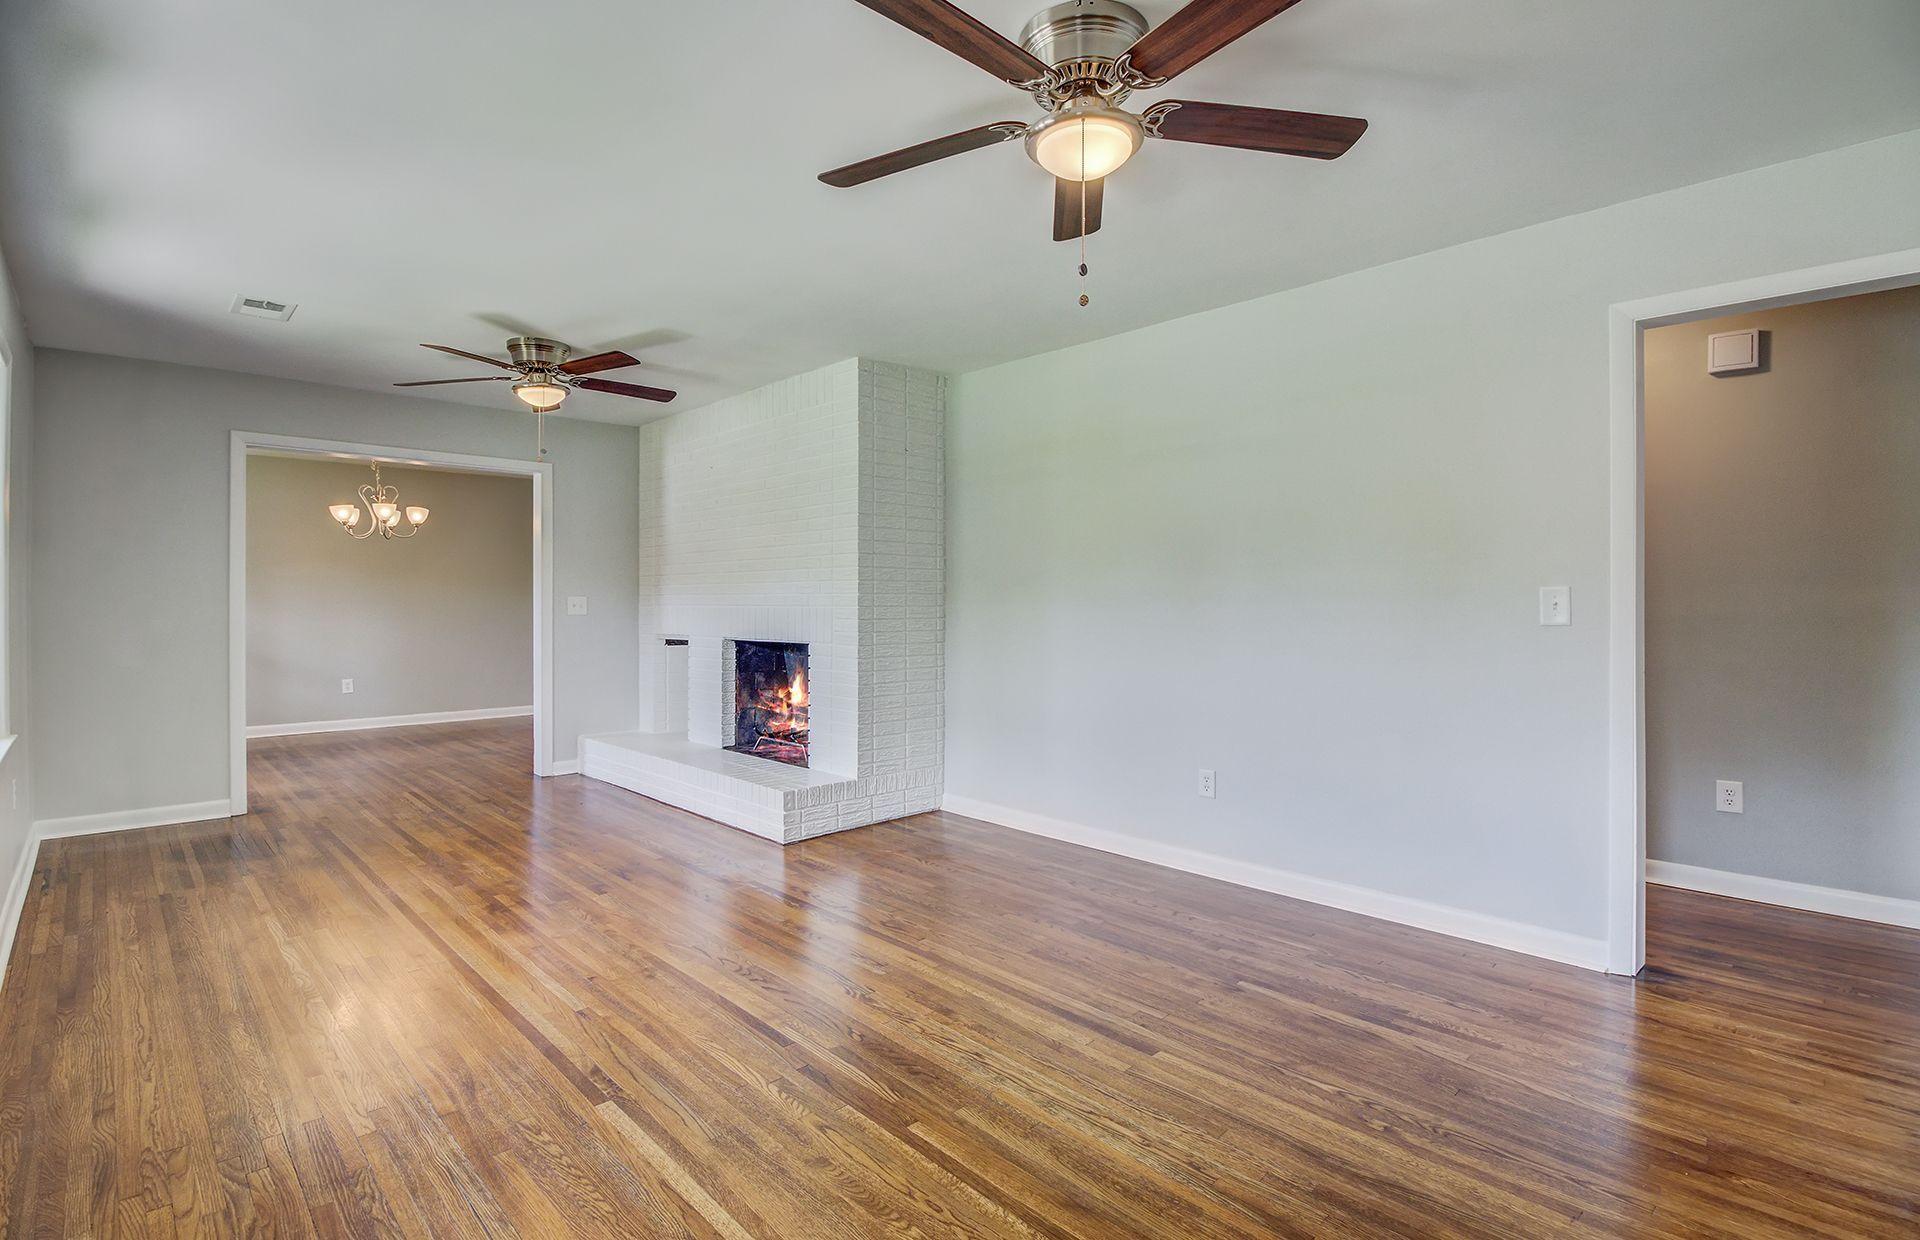 Belvedere Estates Homes For Sale - 6010 Ridgecrest, Hanahan, SC - 9